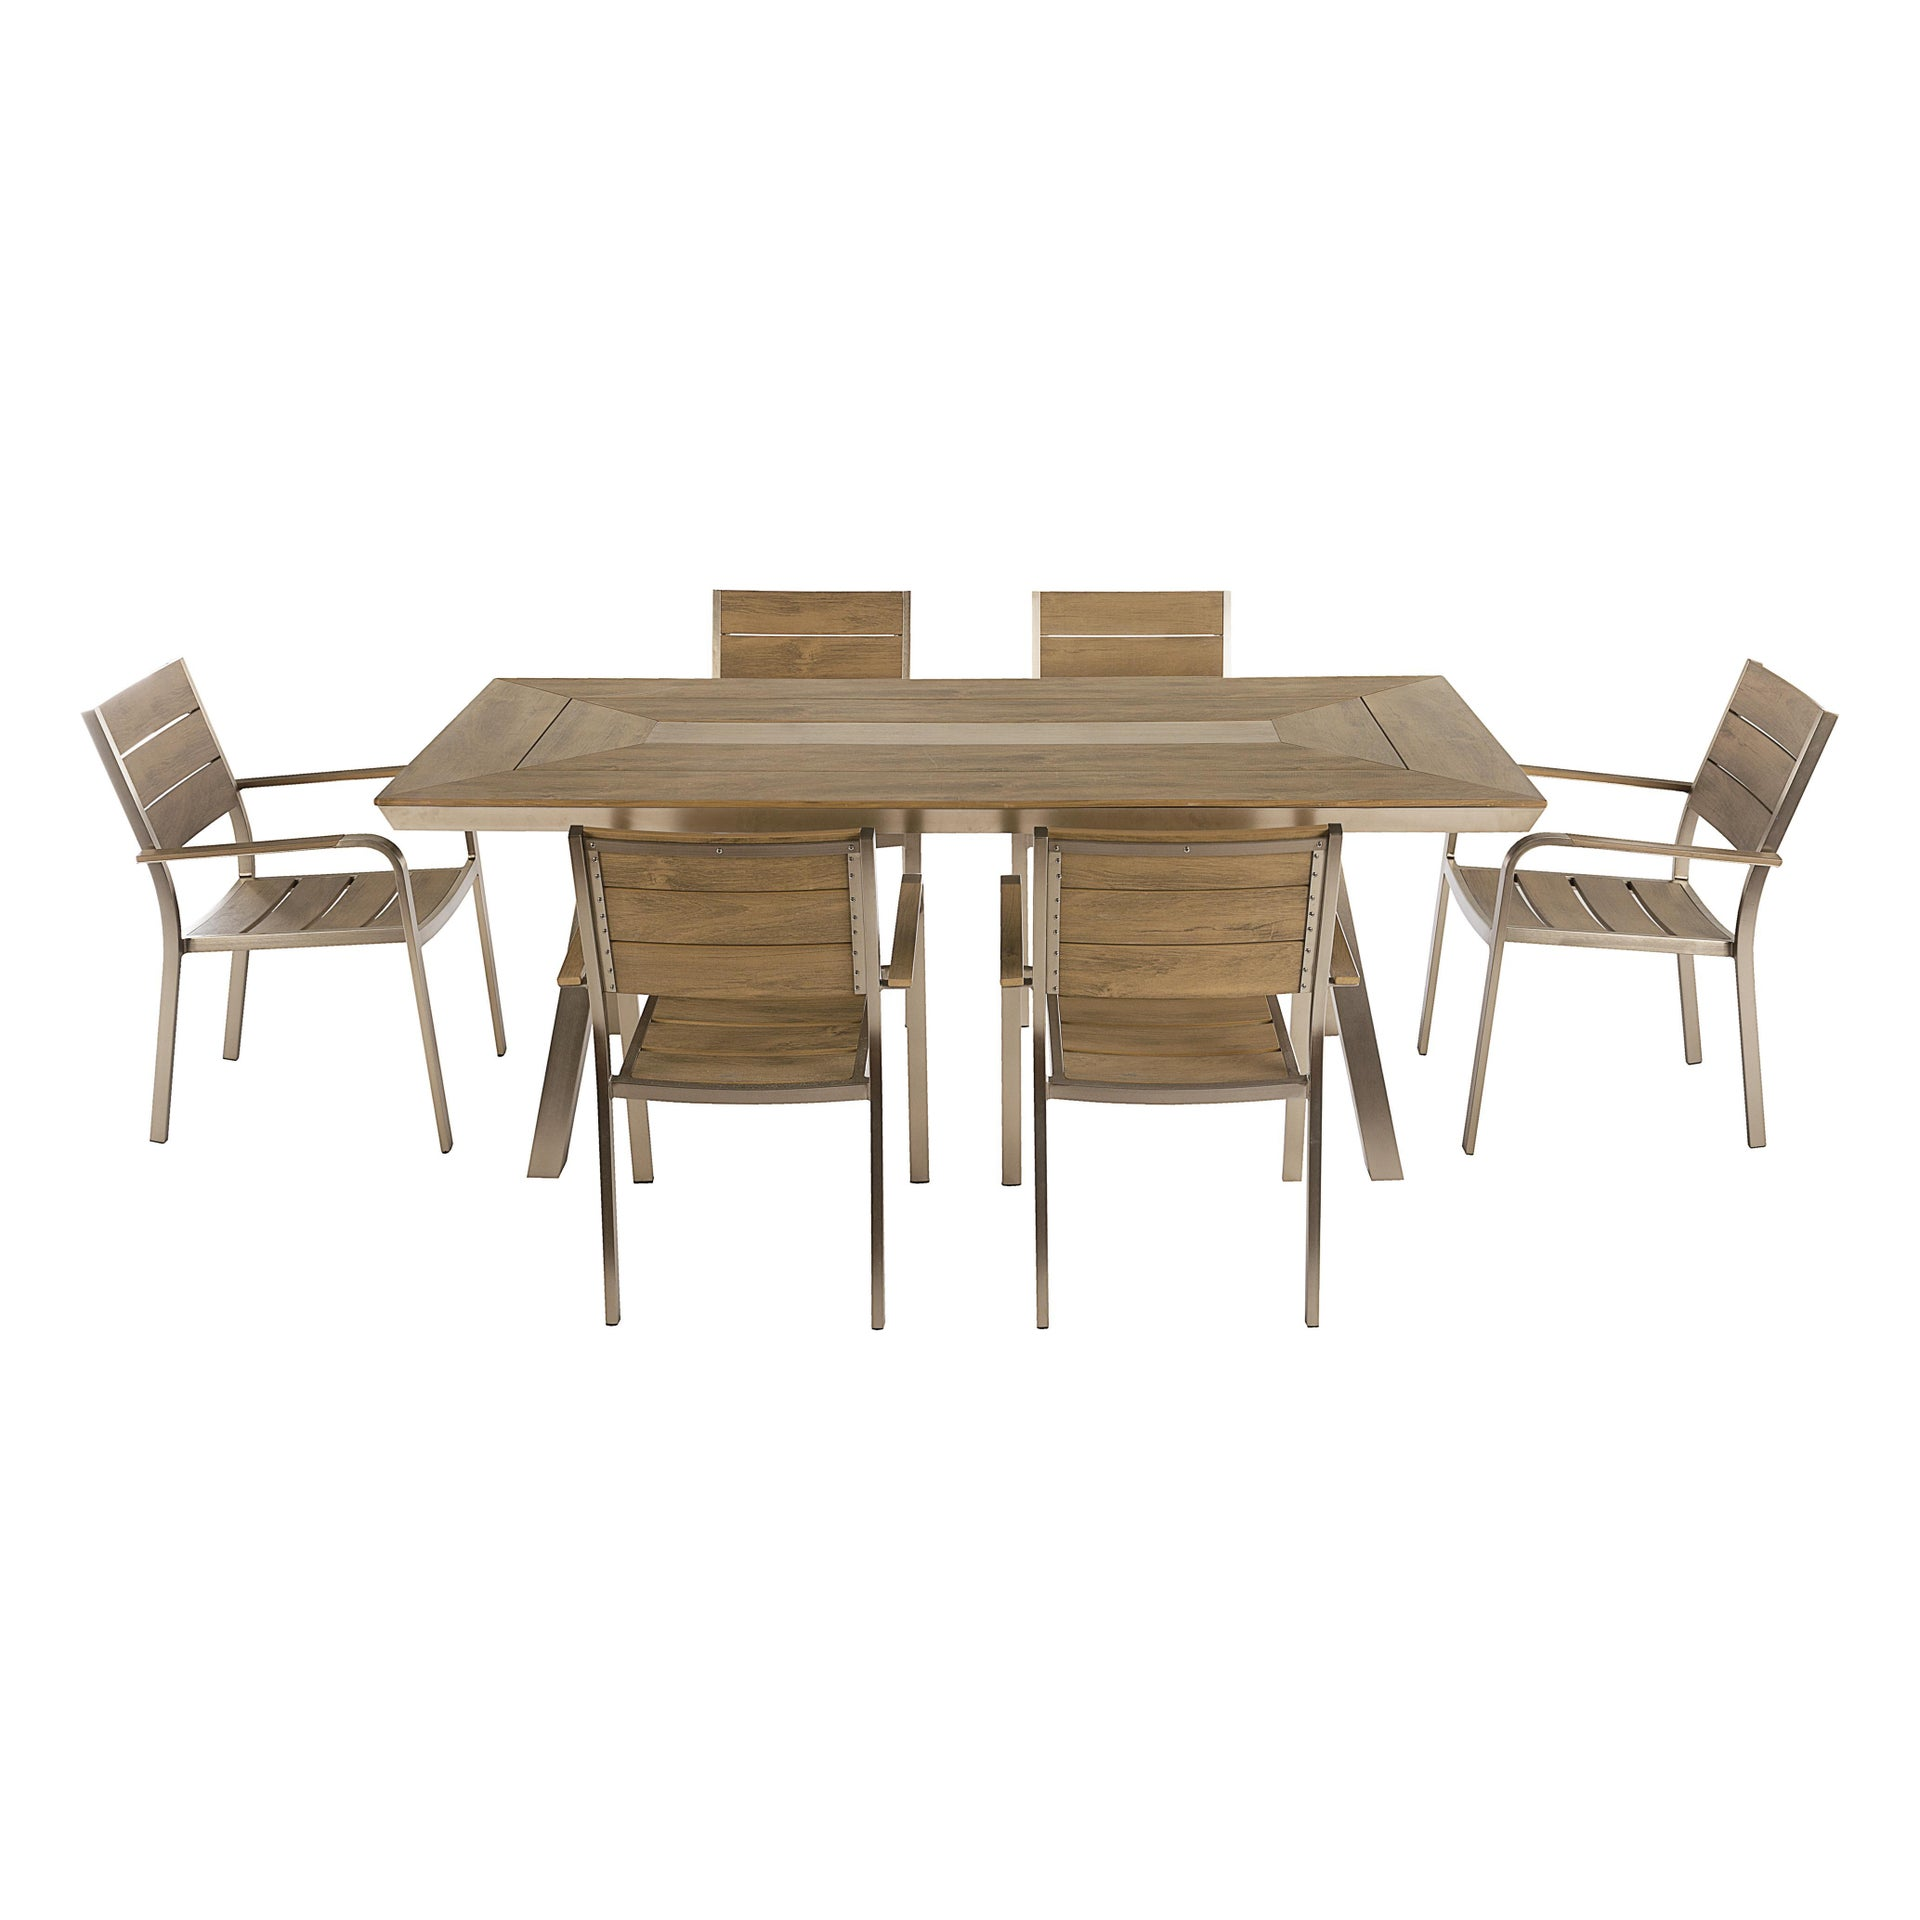 Set tavolo e sedie Kiev in alluminio marrone 6 posti - 3